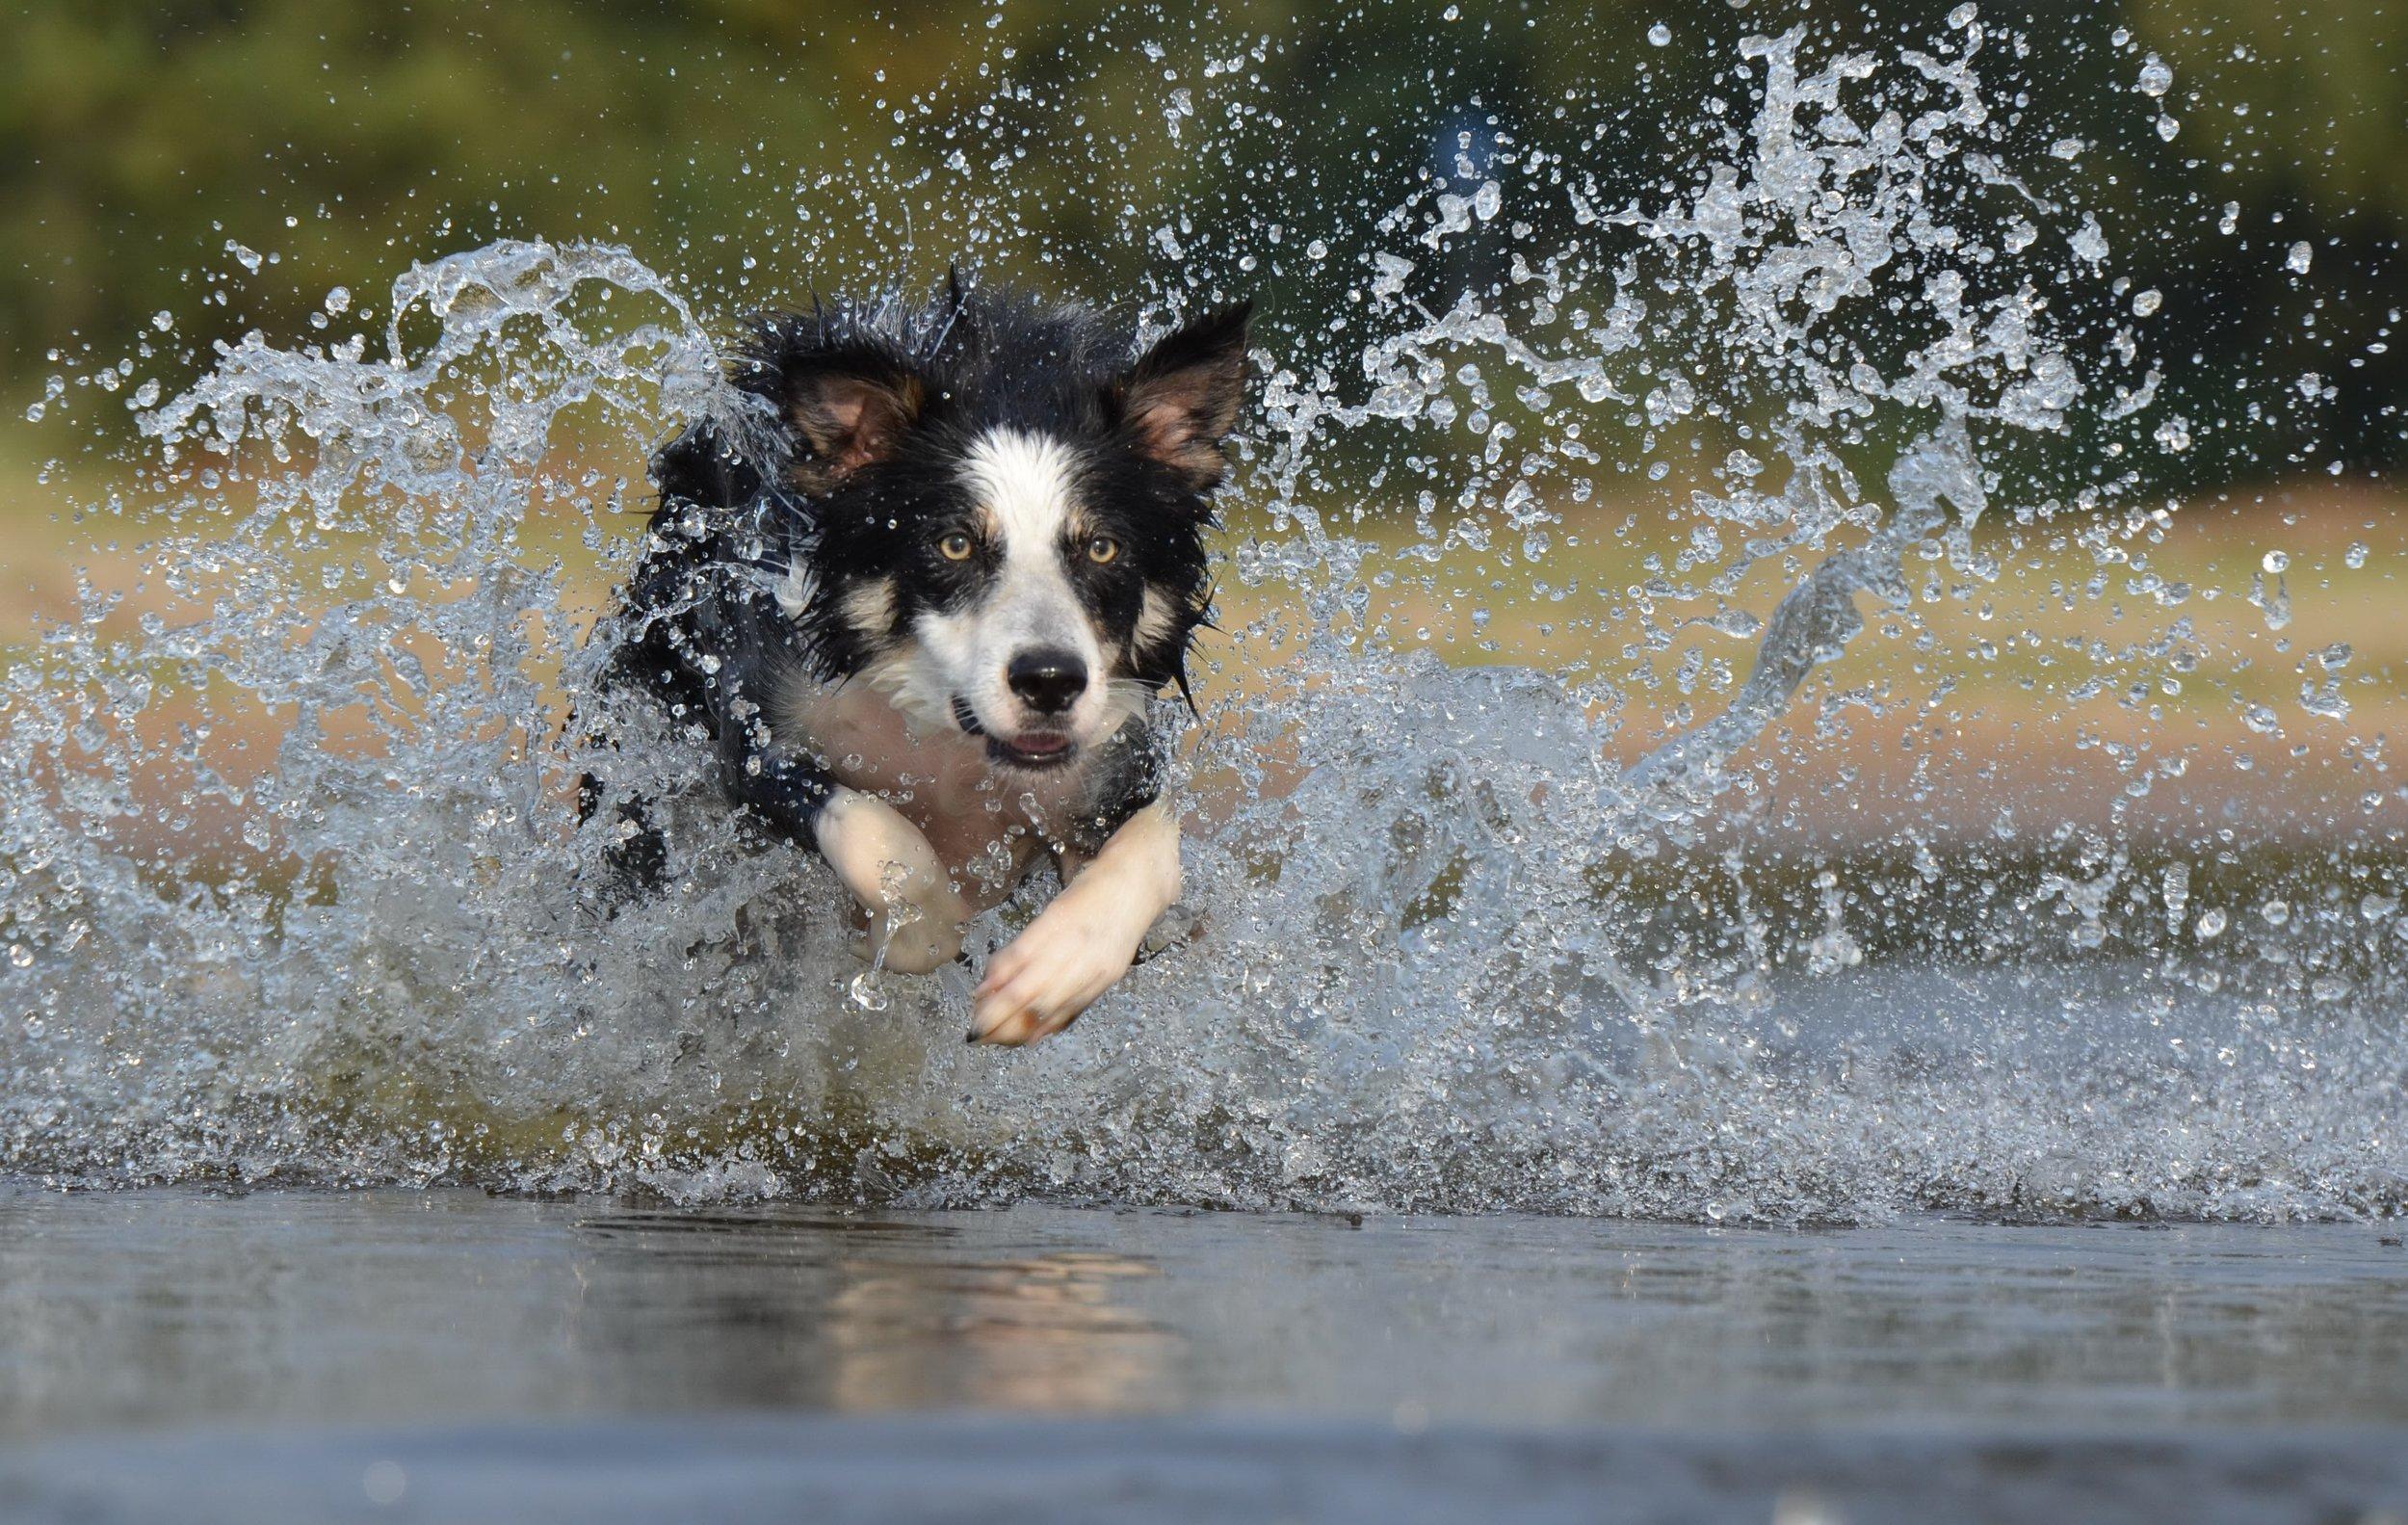 border-collie-jump-water-british-sheepdog-37860.jpeg